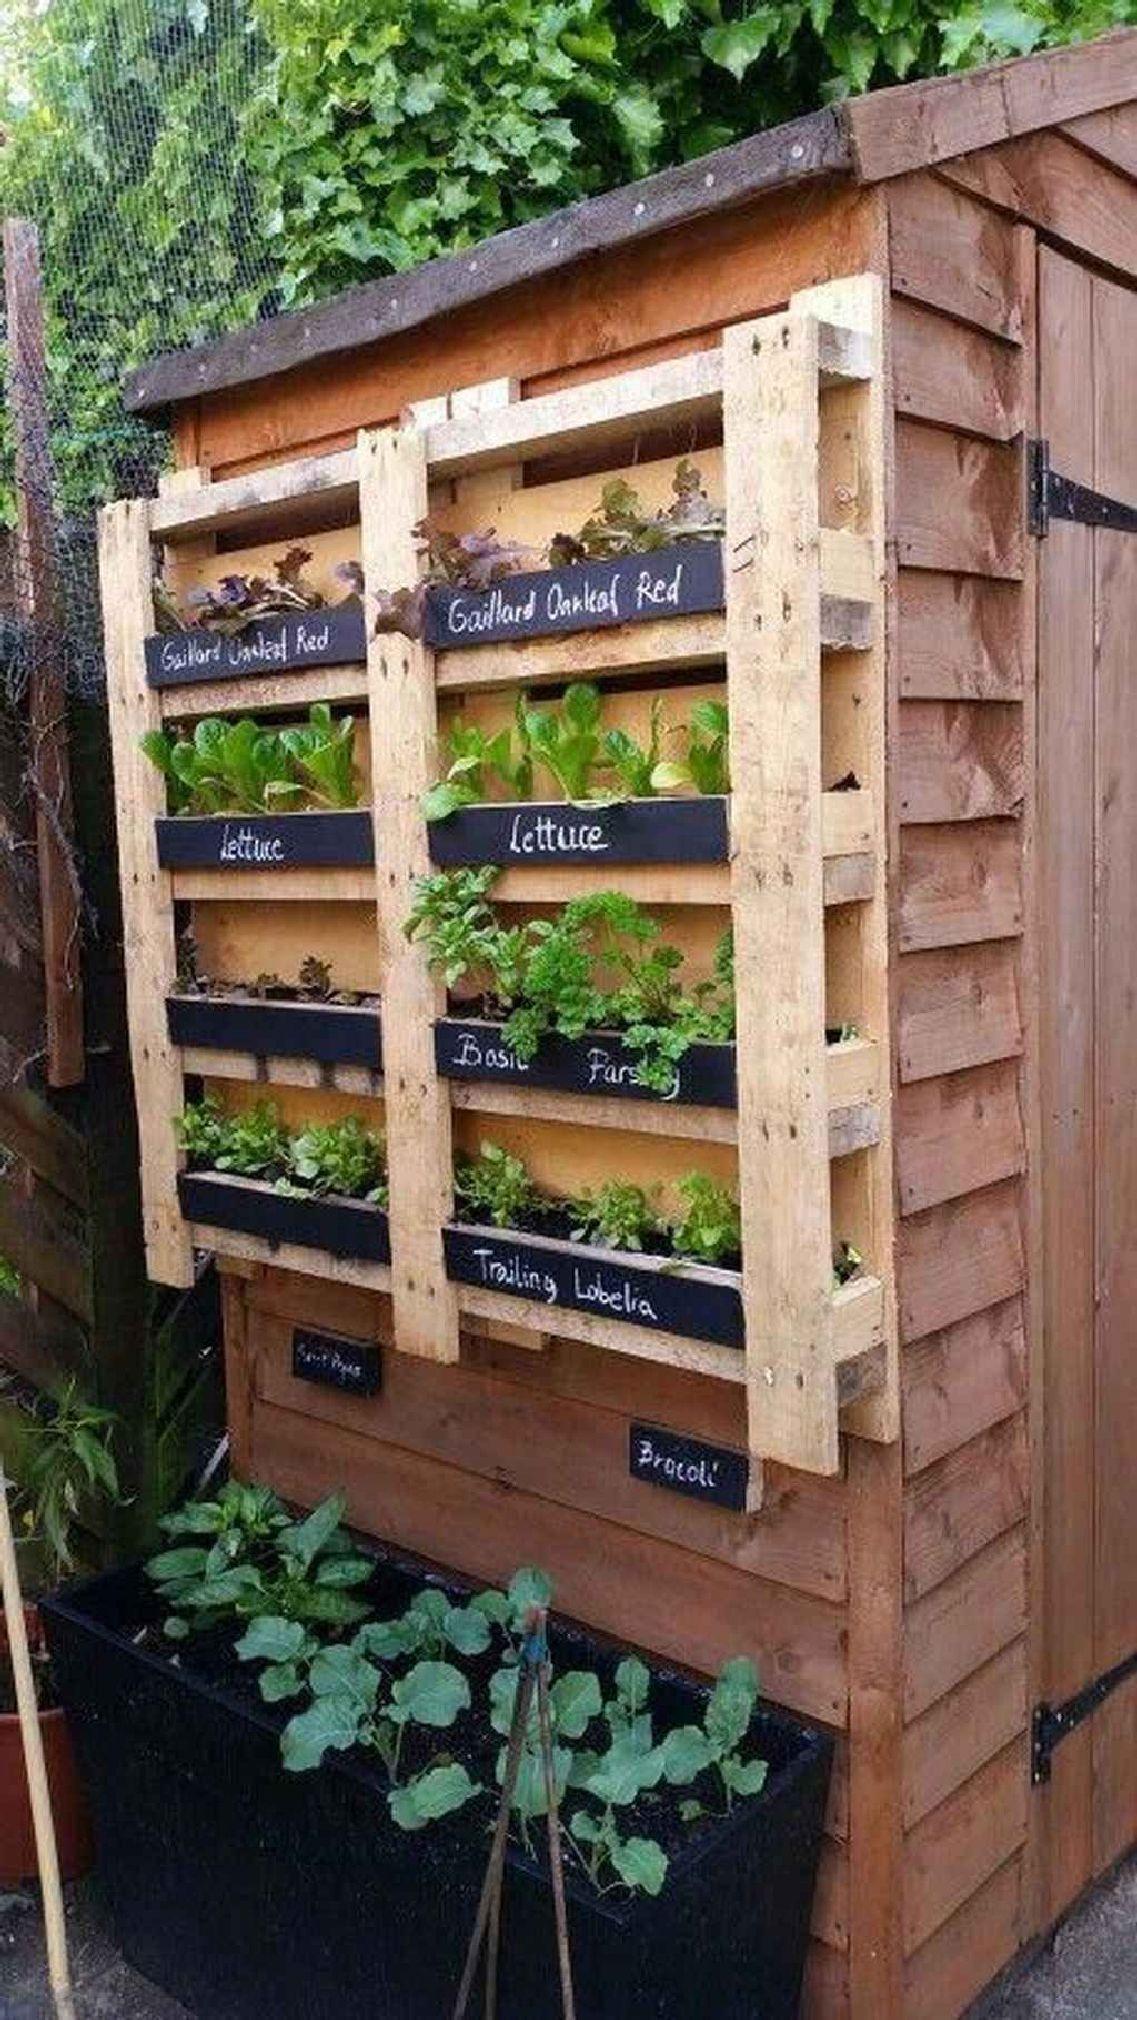 44 Simple But Pretty Diy Vertical Garden Design Ideas Vertical Garden Diy Vertical Garden Design Vertical Garden